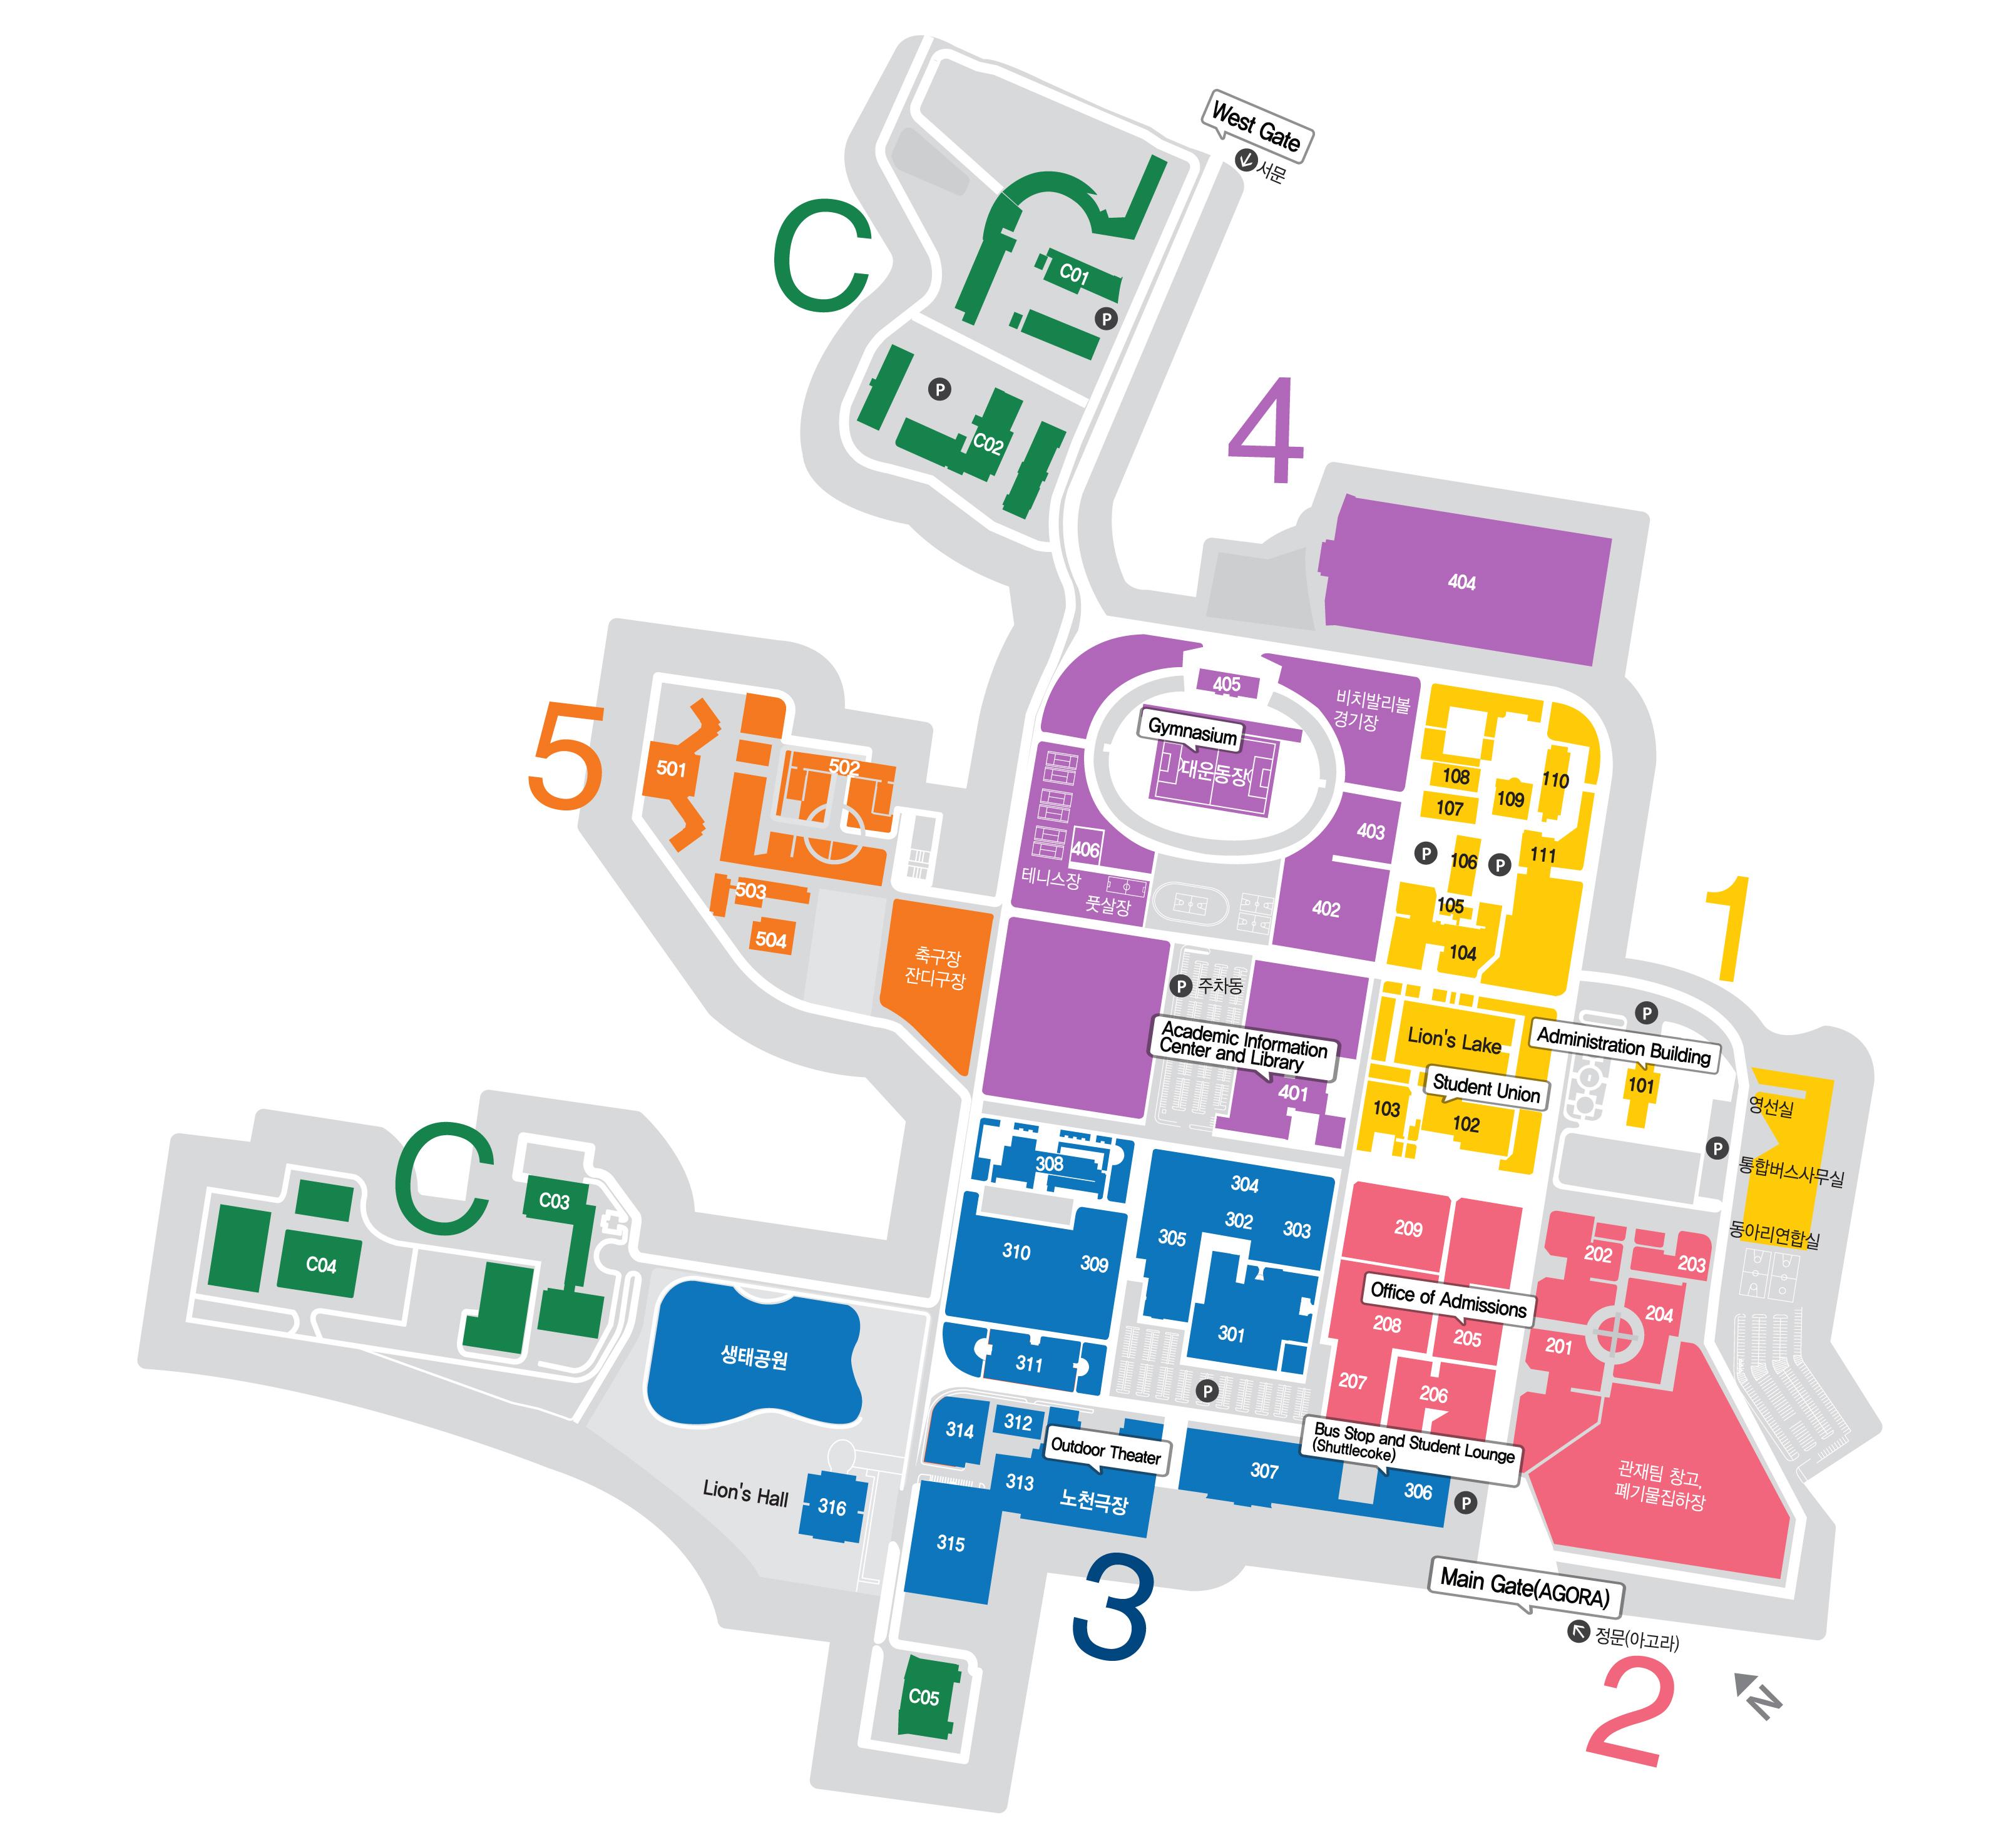 hanyang university campus map Campus Map Directions Hanyang University hanyang university campus map